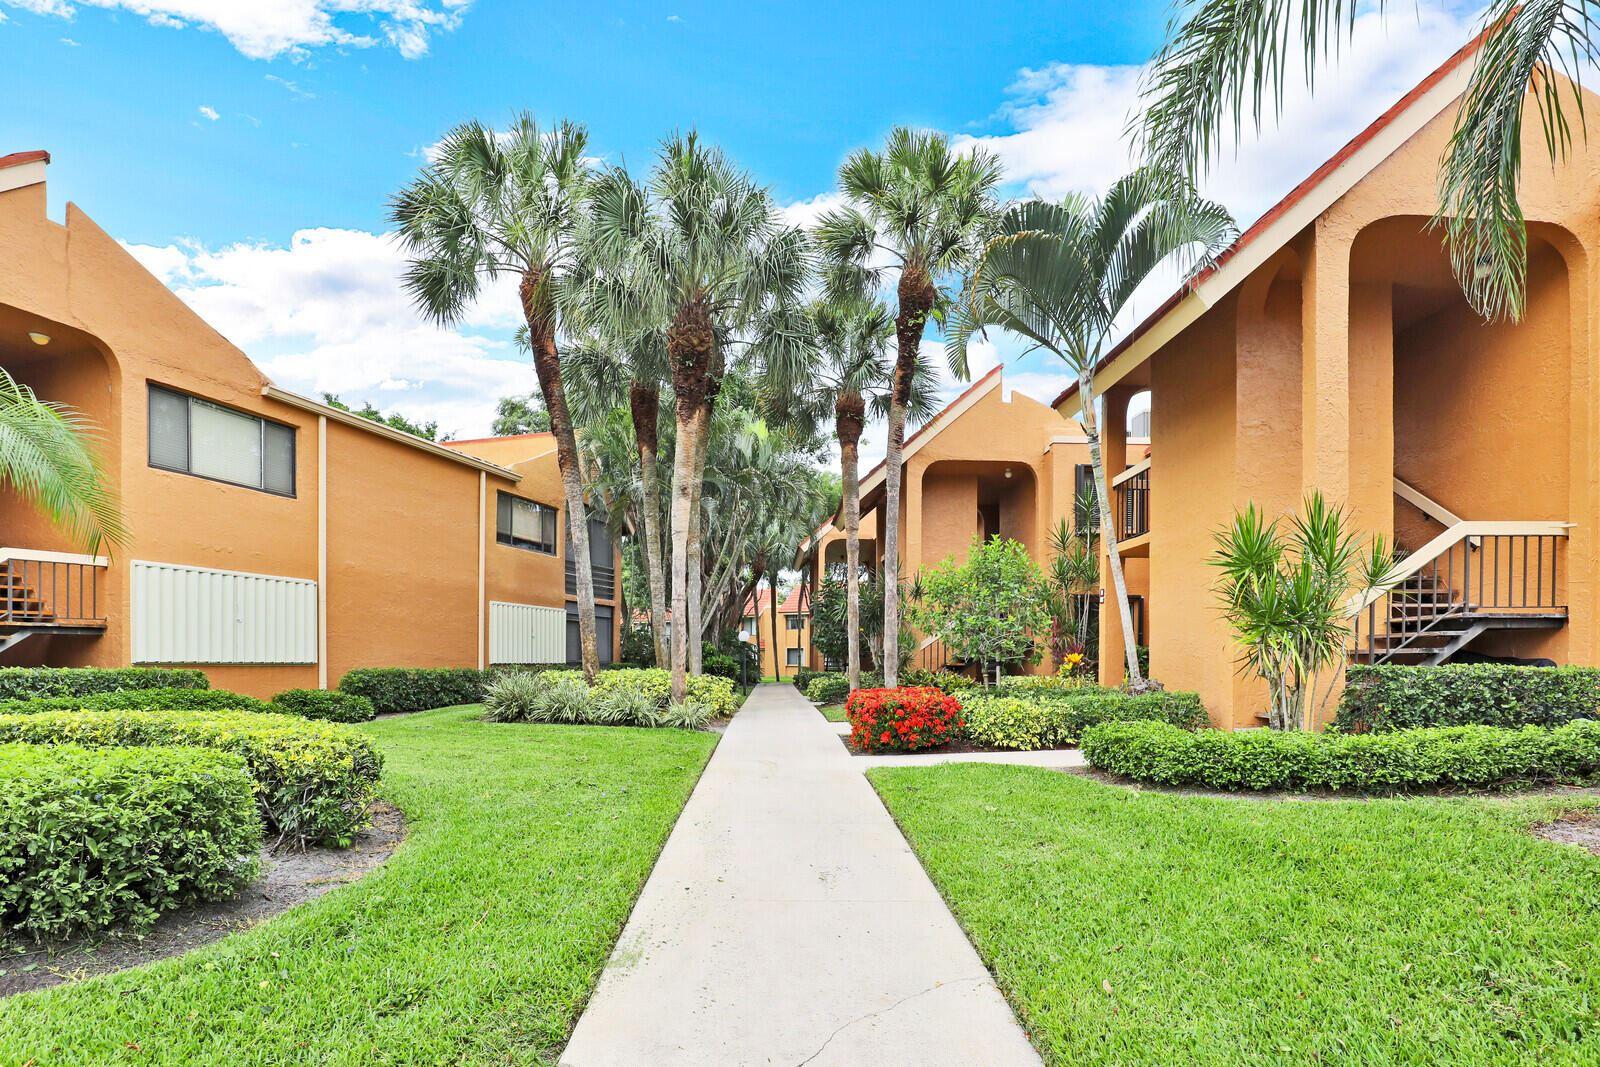 11230 Green Lake Drive #201, Boynton Beach, FL 33437 - MLS#: RX-10730977